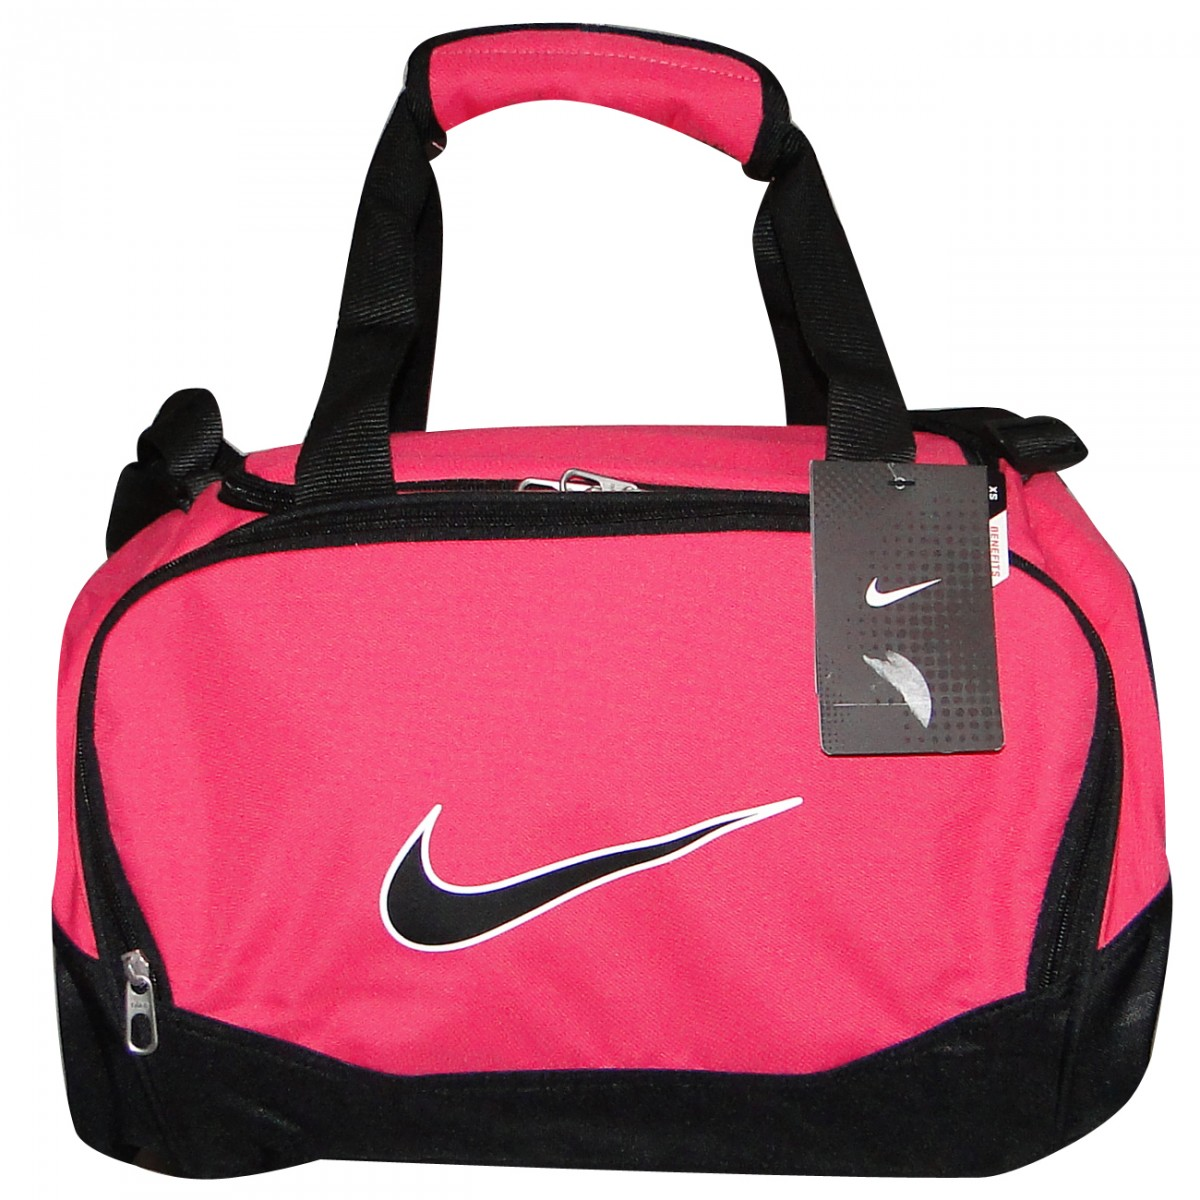 bolsa rosa da adidas